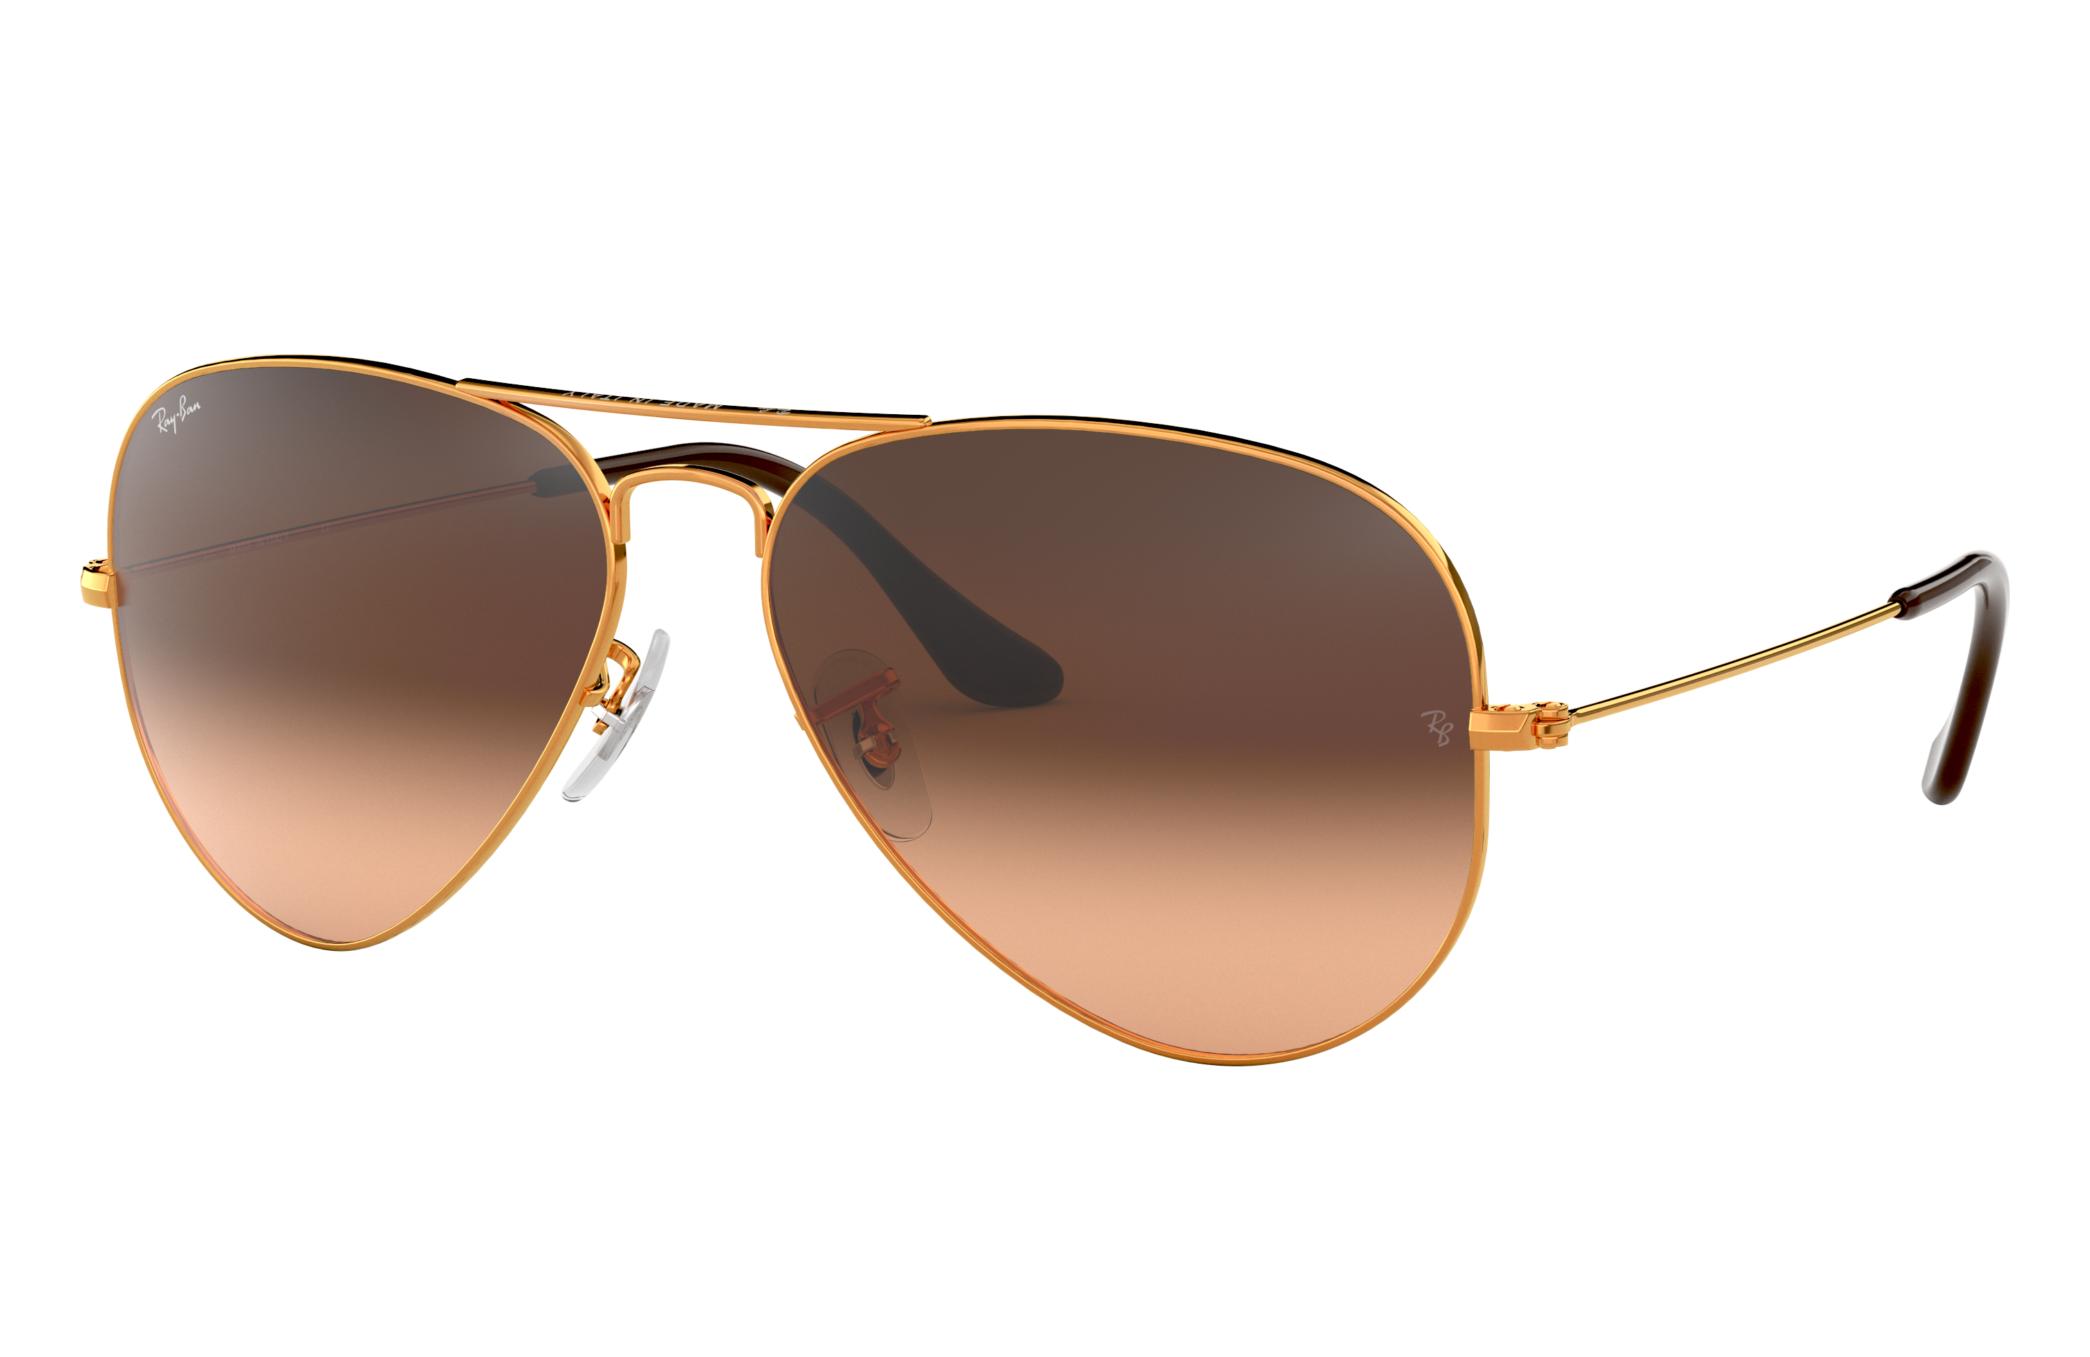 Ray-Ban Aviator Gradient Bronze-Copper, Pink Lenses - RB3025